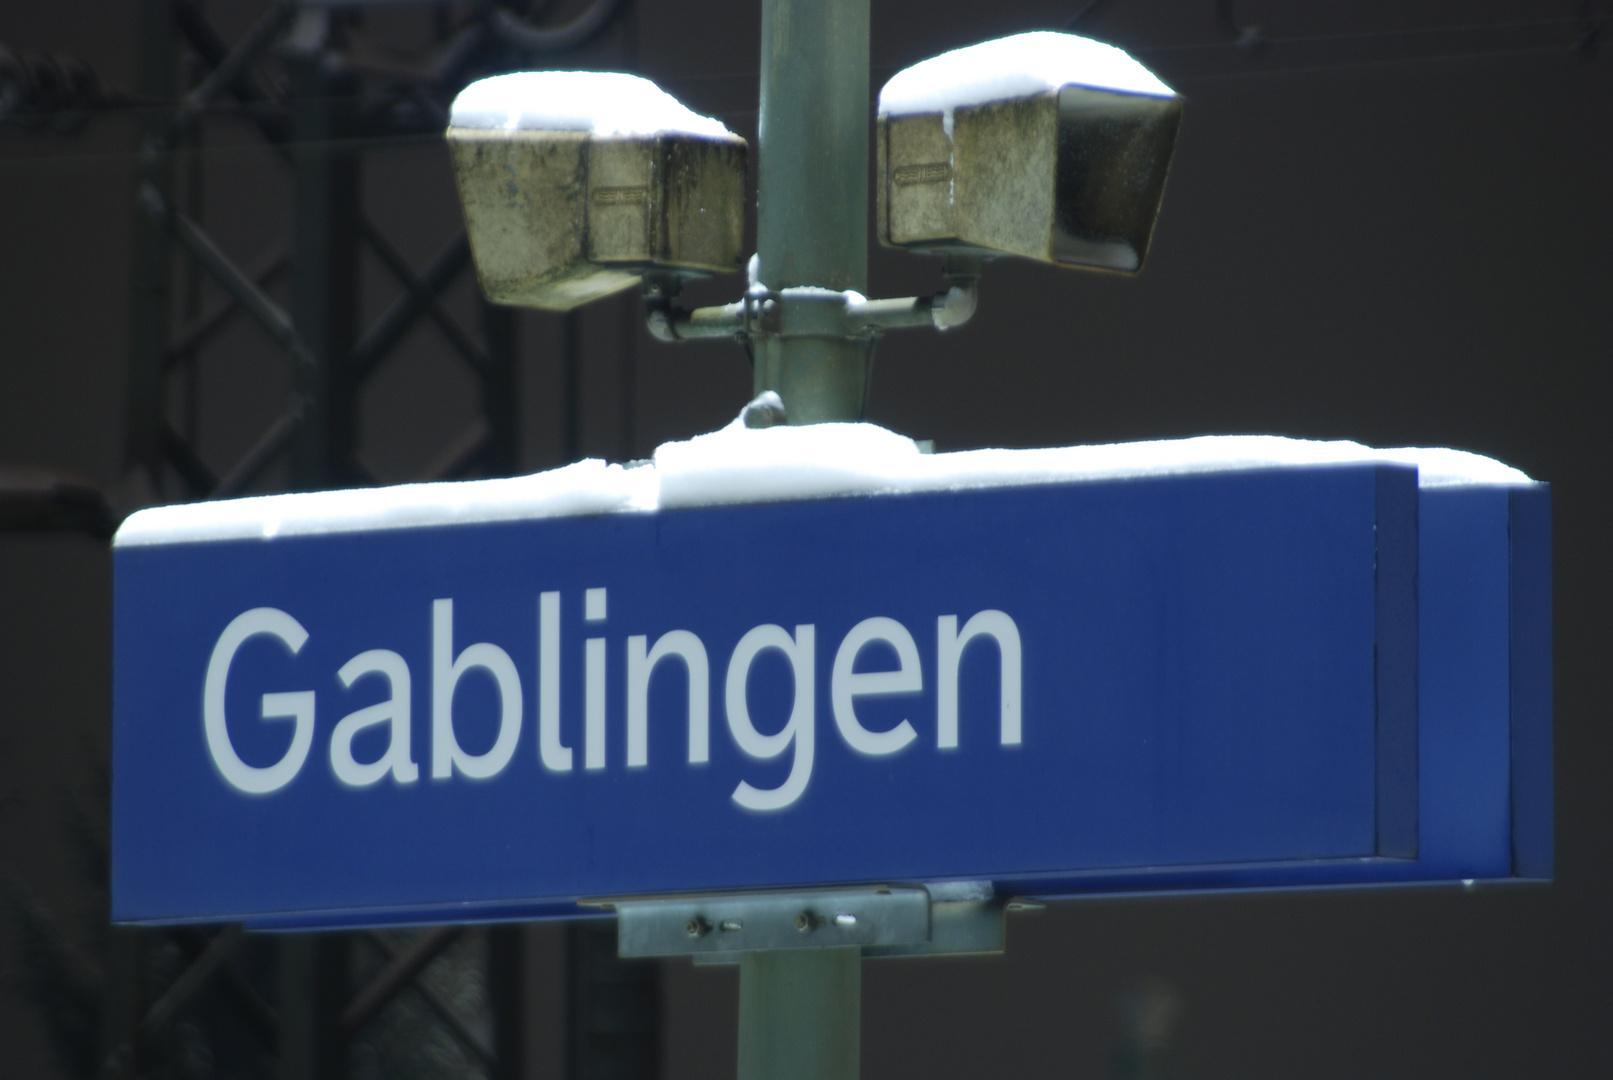 Bahnhof Gablingen bei Nacht